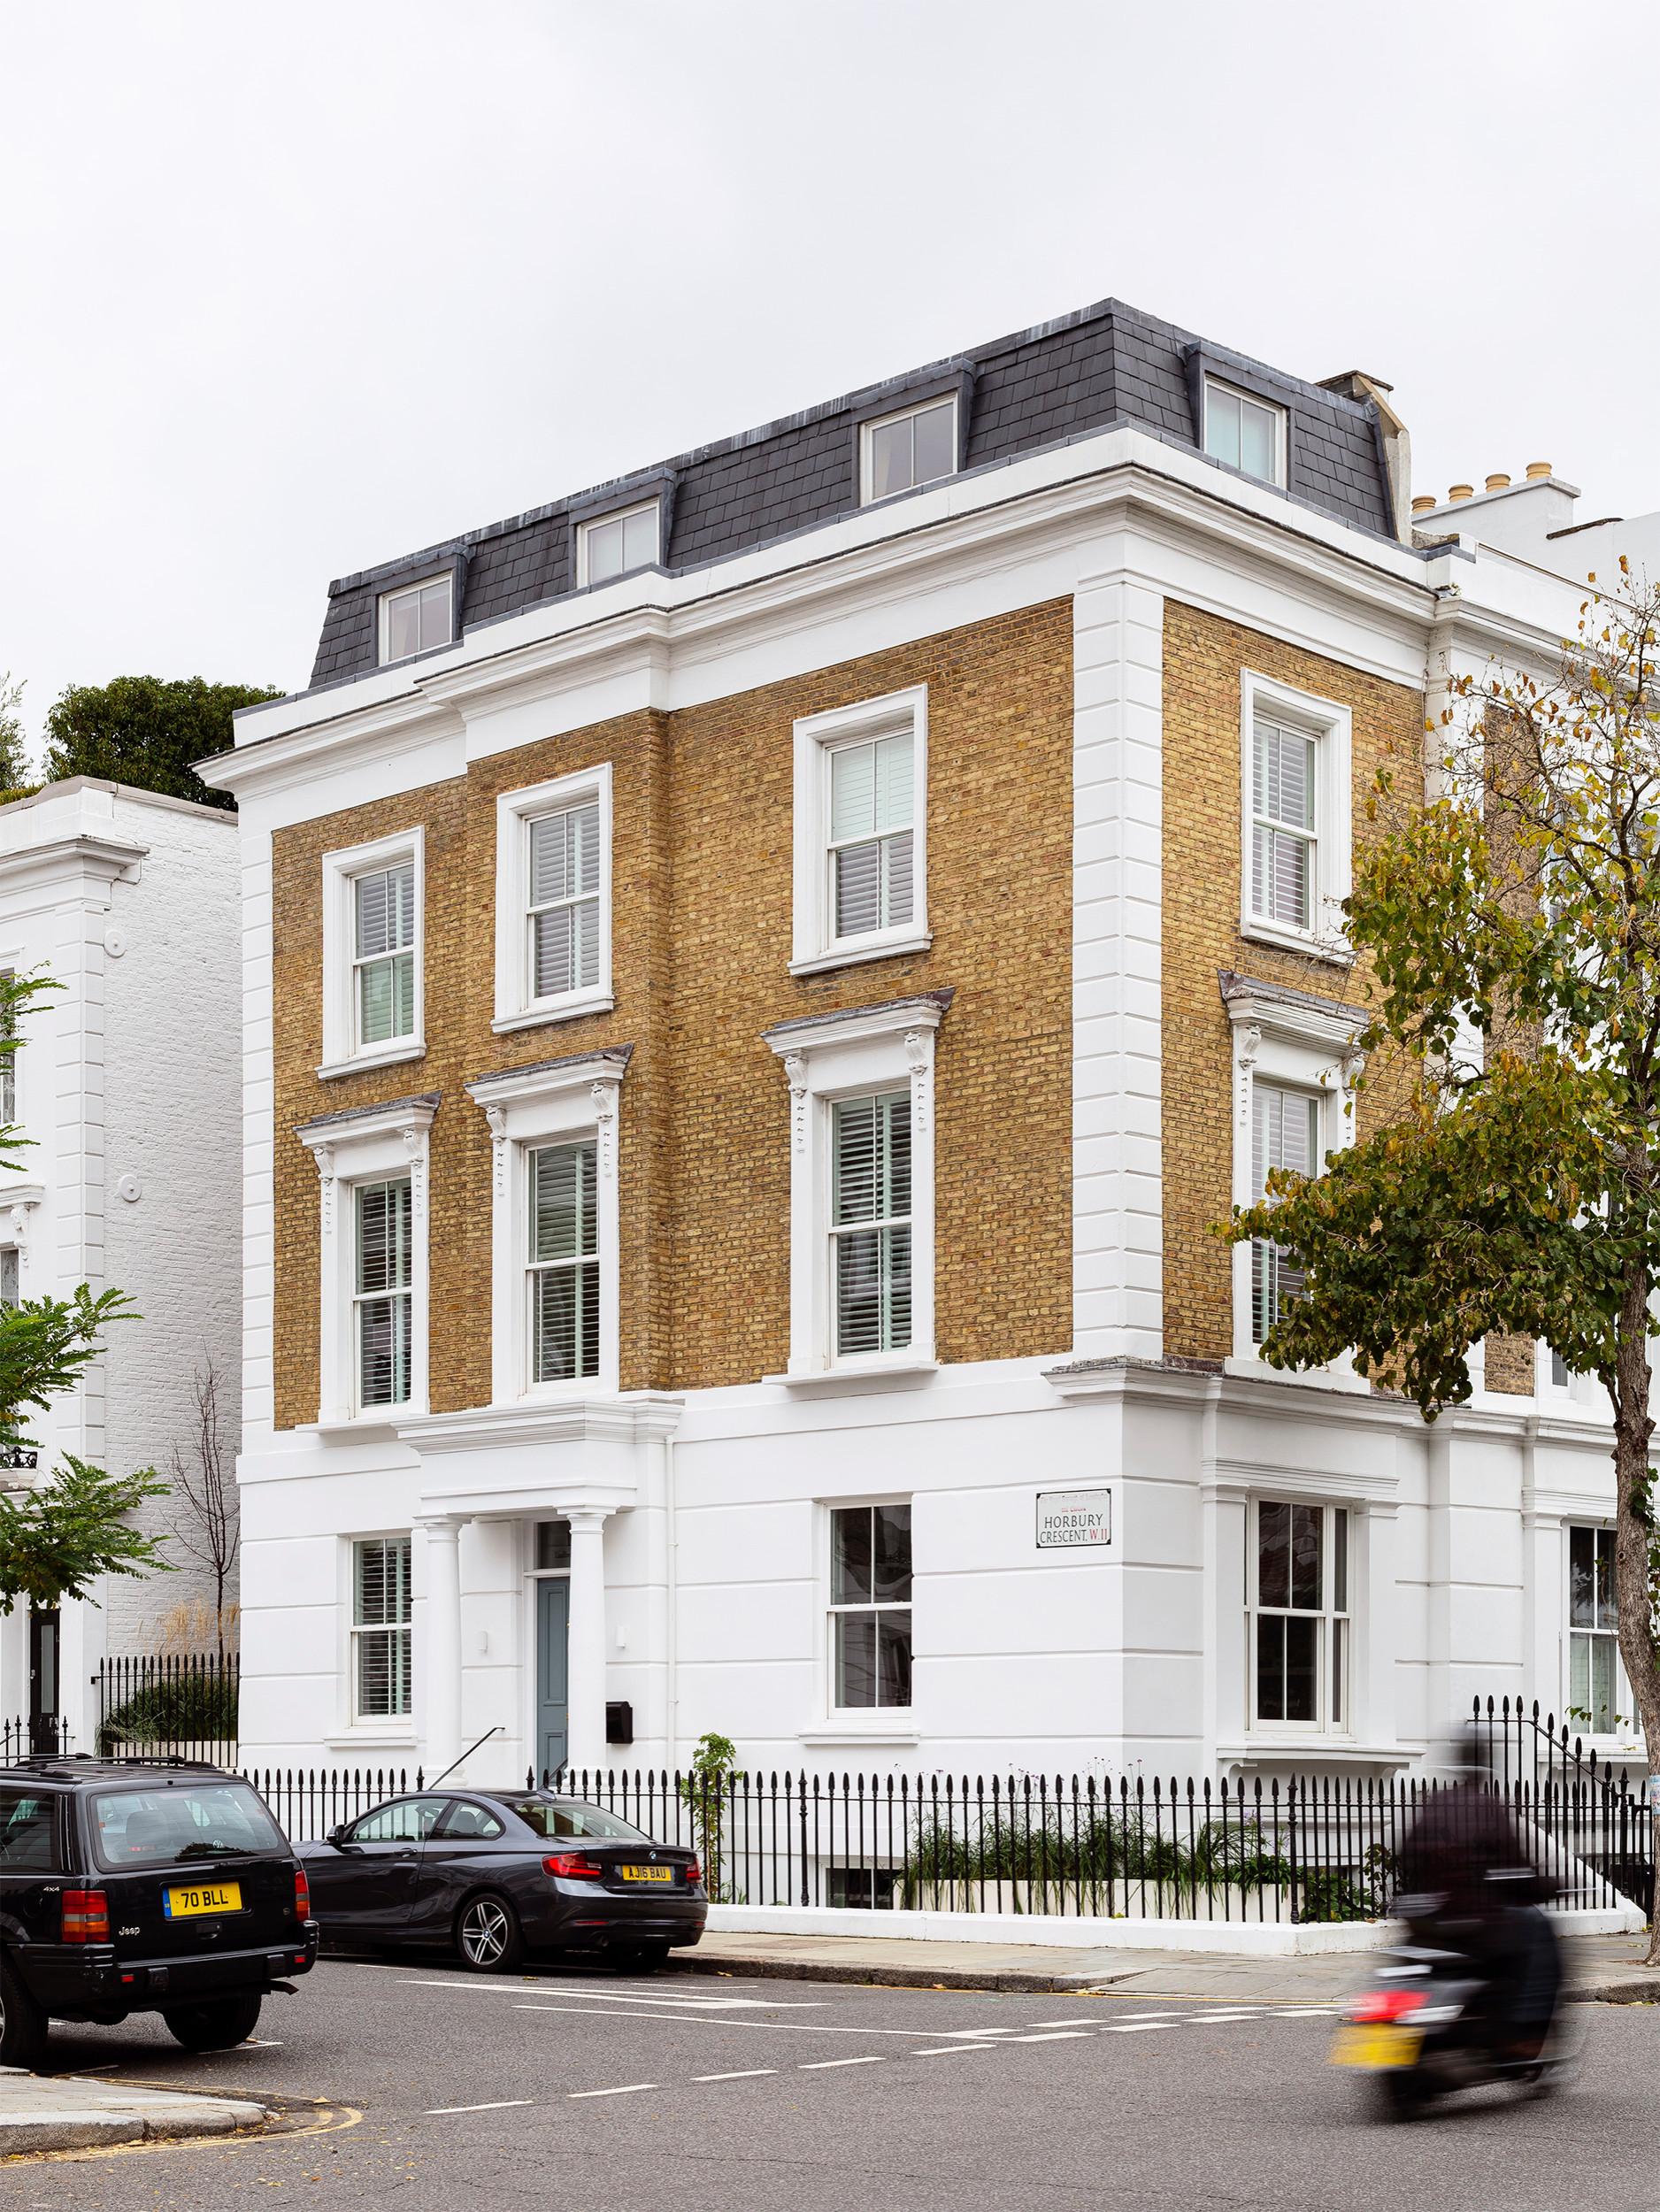 Ladbroke Road, Notting Hill, London - W11